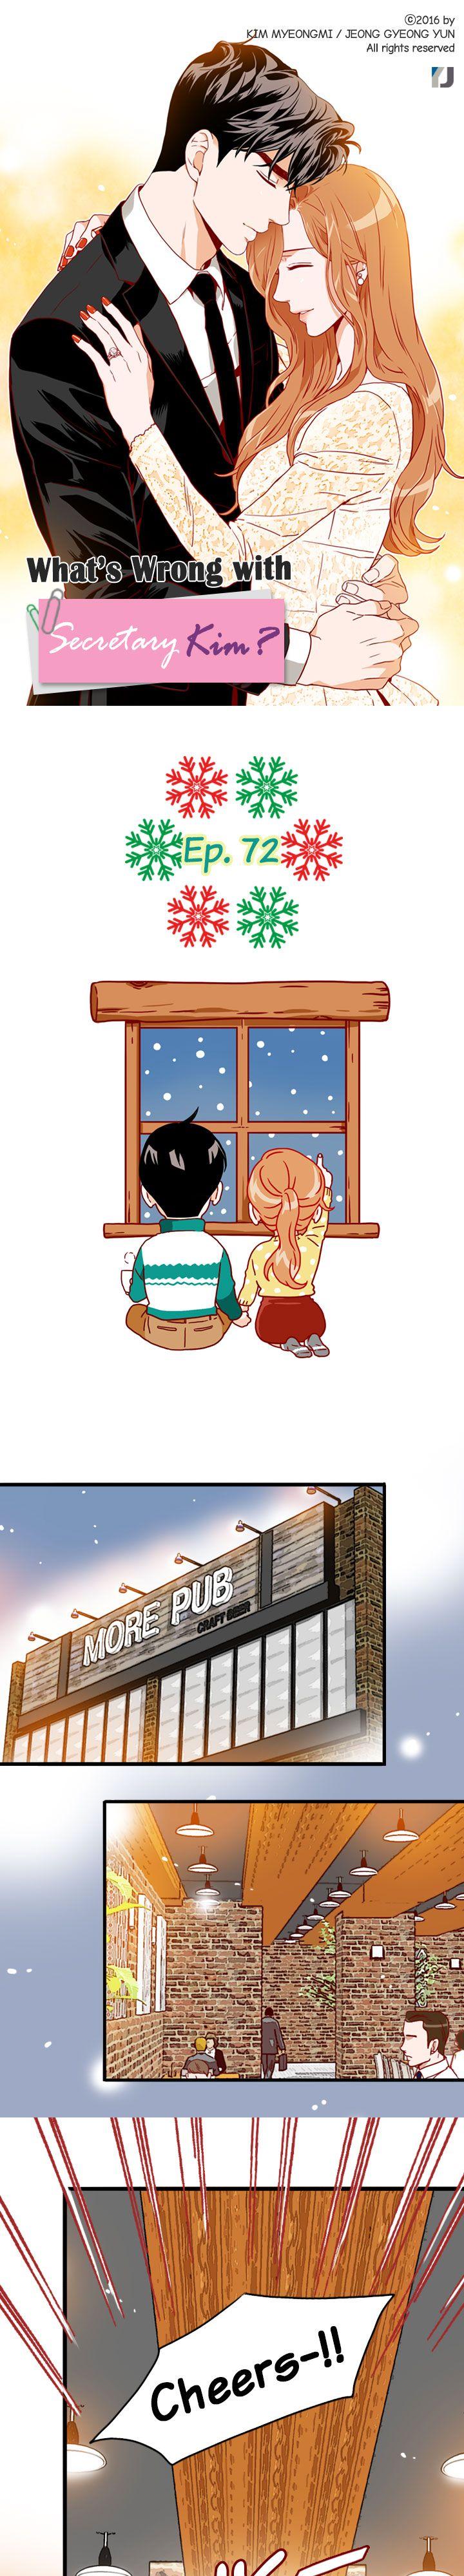 https://manga.mangadogs.com/comics/pic2/15/25807/960729/65378614c4adbc65cc1643a8bd221e59.jpg Page 1